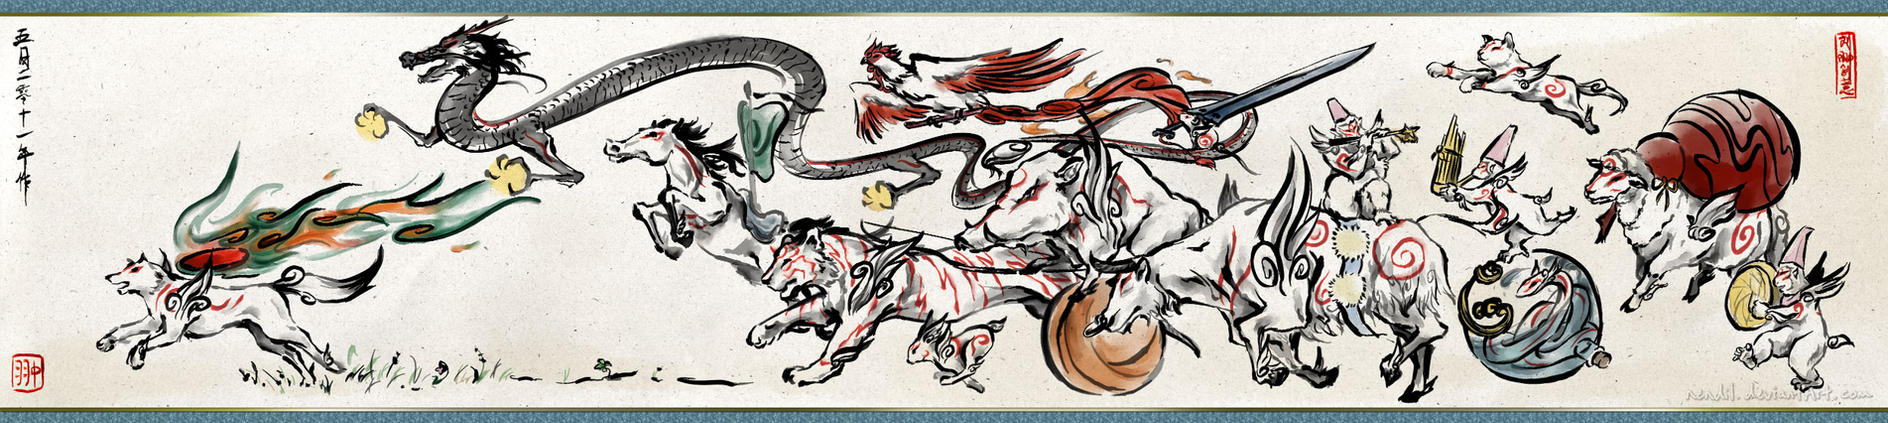 Zodiac Run by Nendil